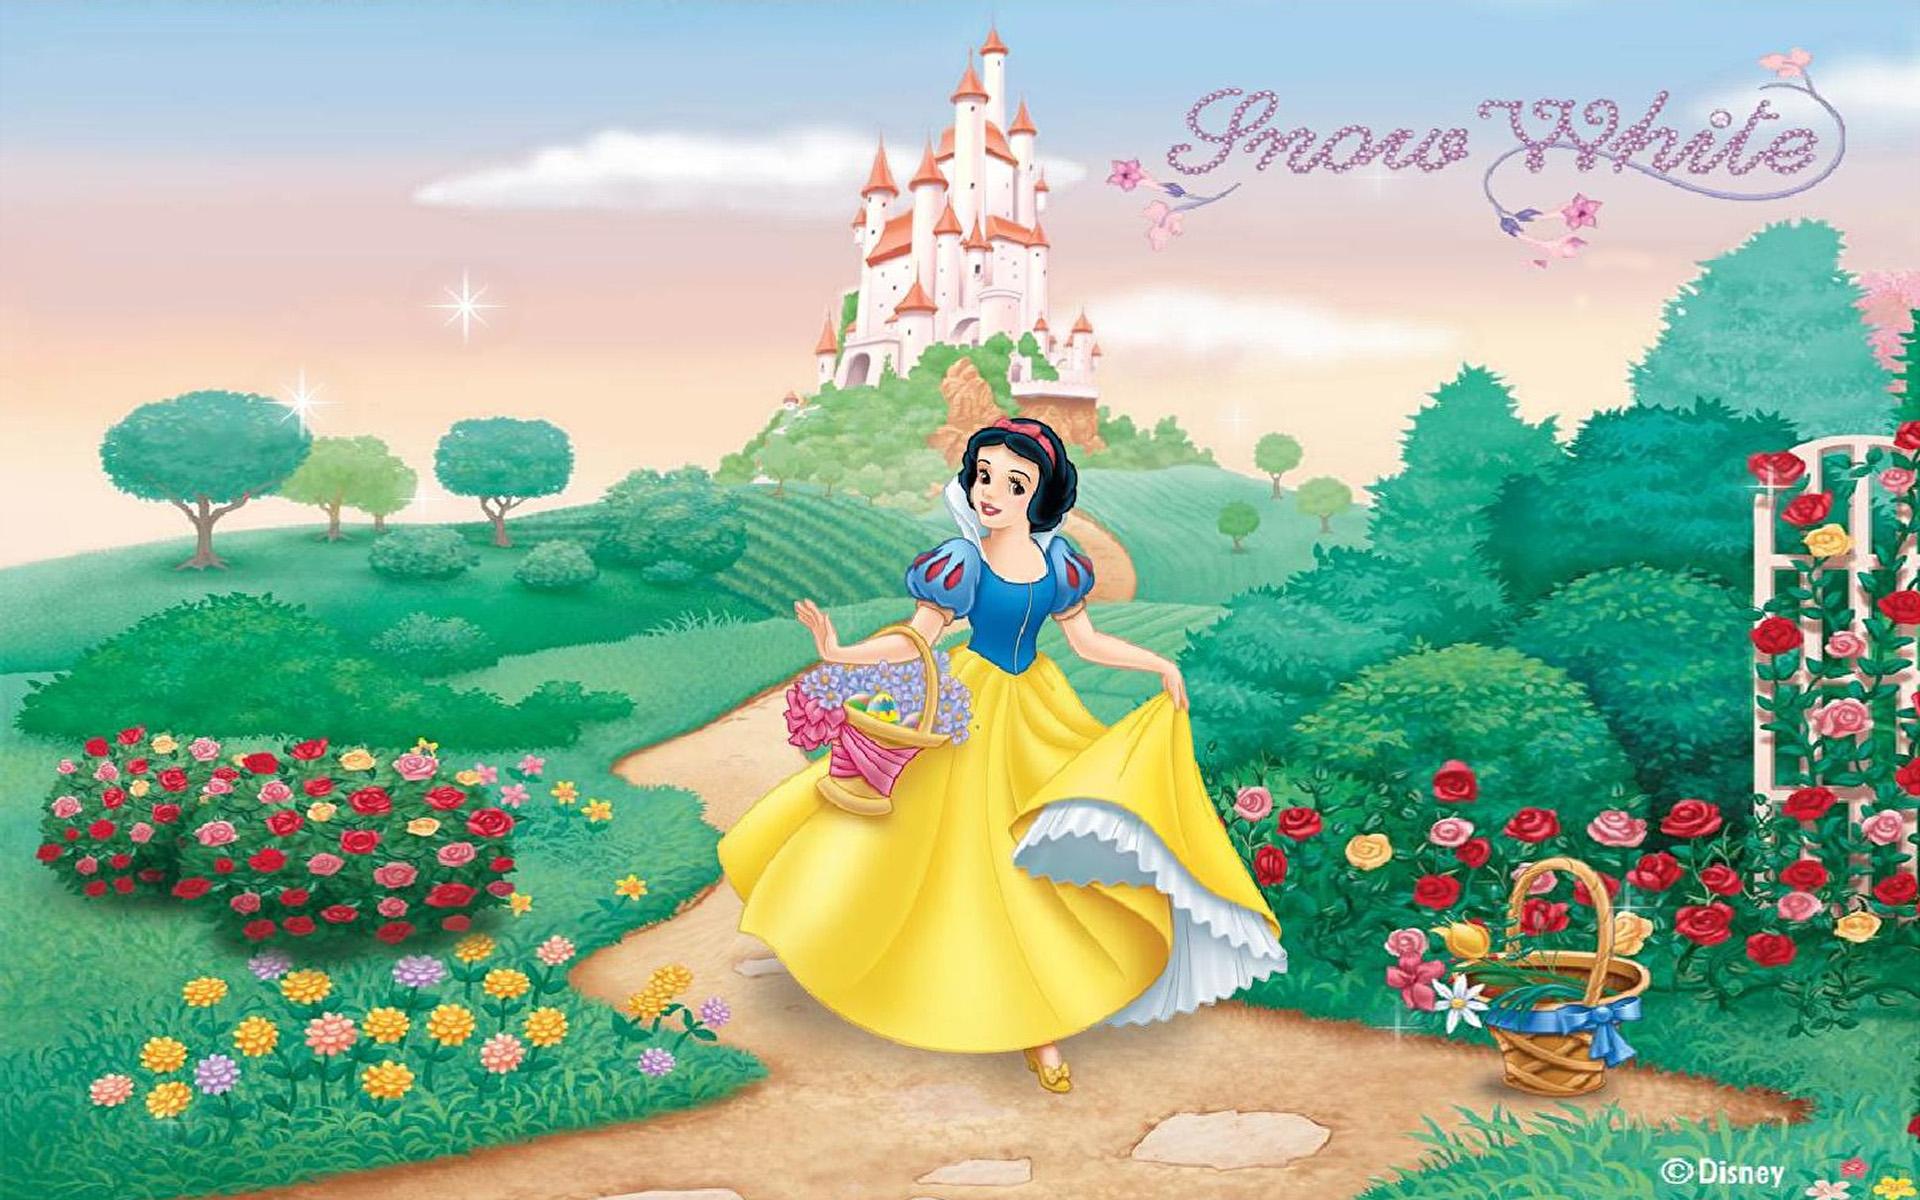 Animated Snow Wallpaper Castle Of Princess Snow White Garden Harvesting Flowers